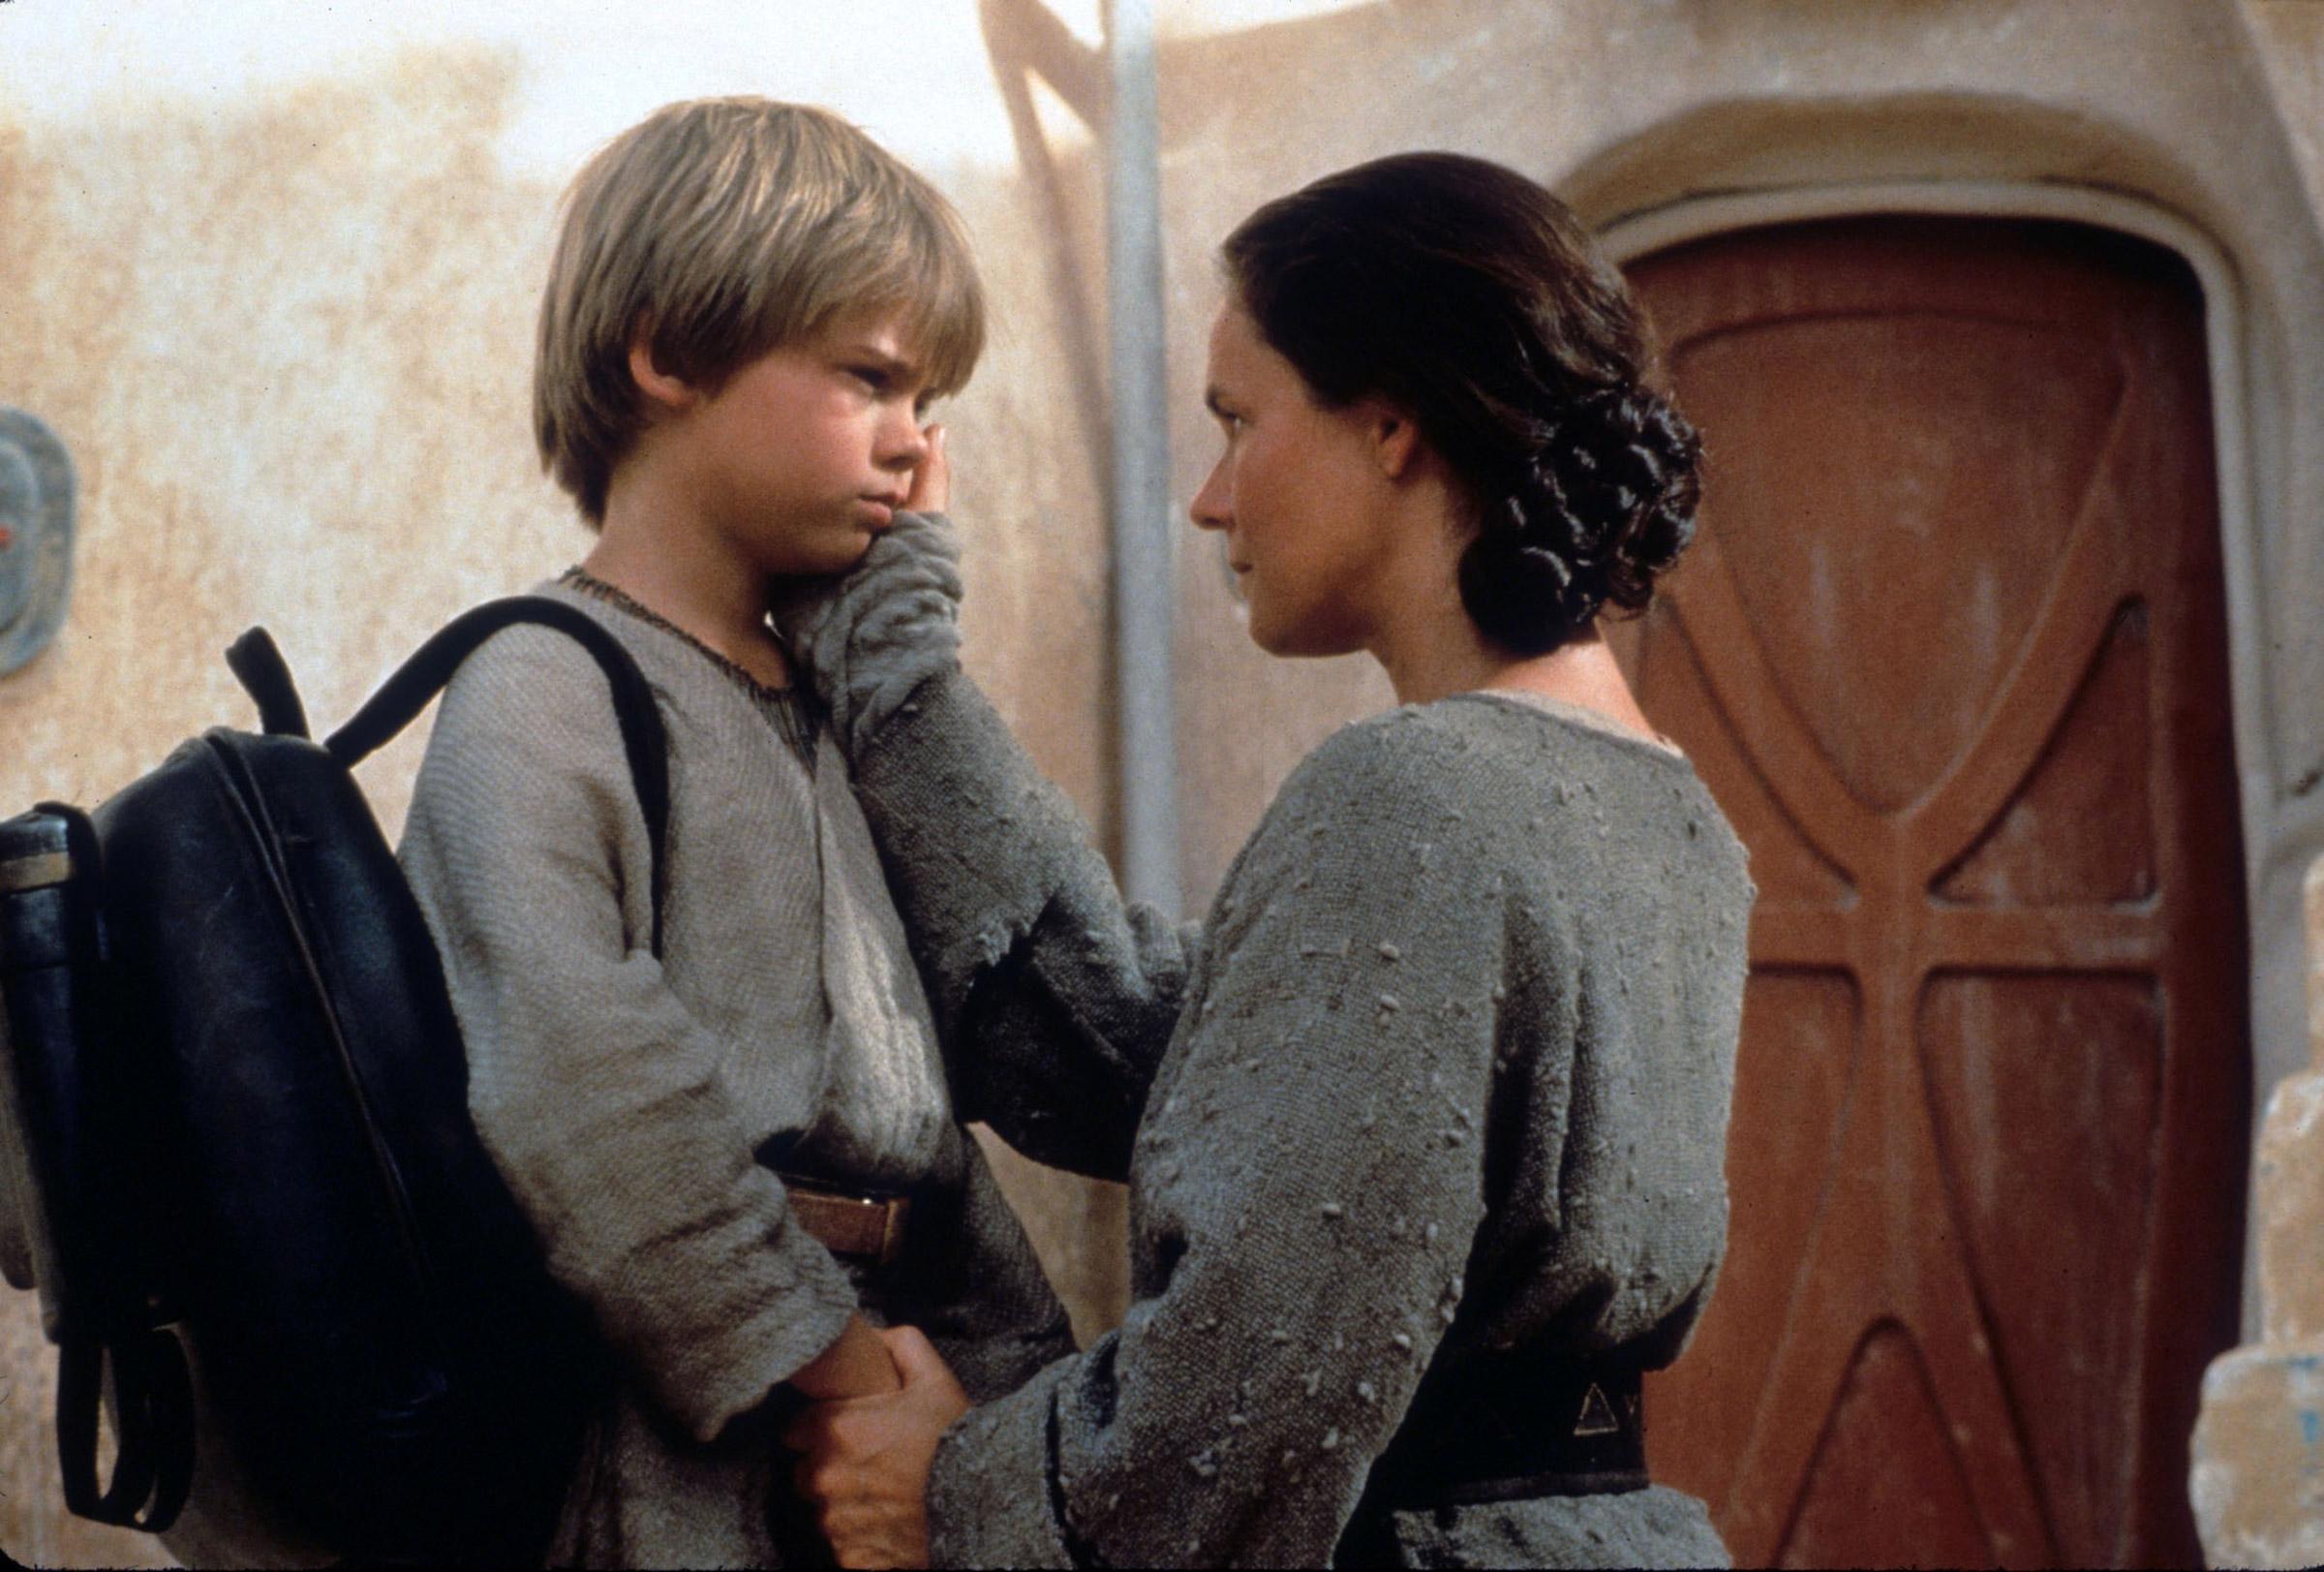 Anakin Skywalker in Star Wars Episode I - The Phantom Menace